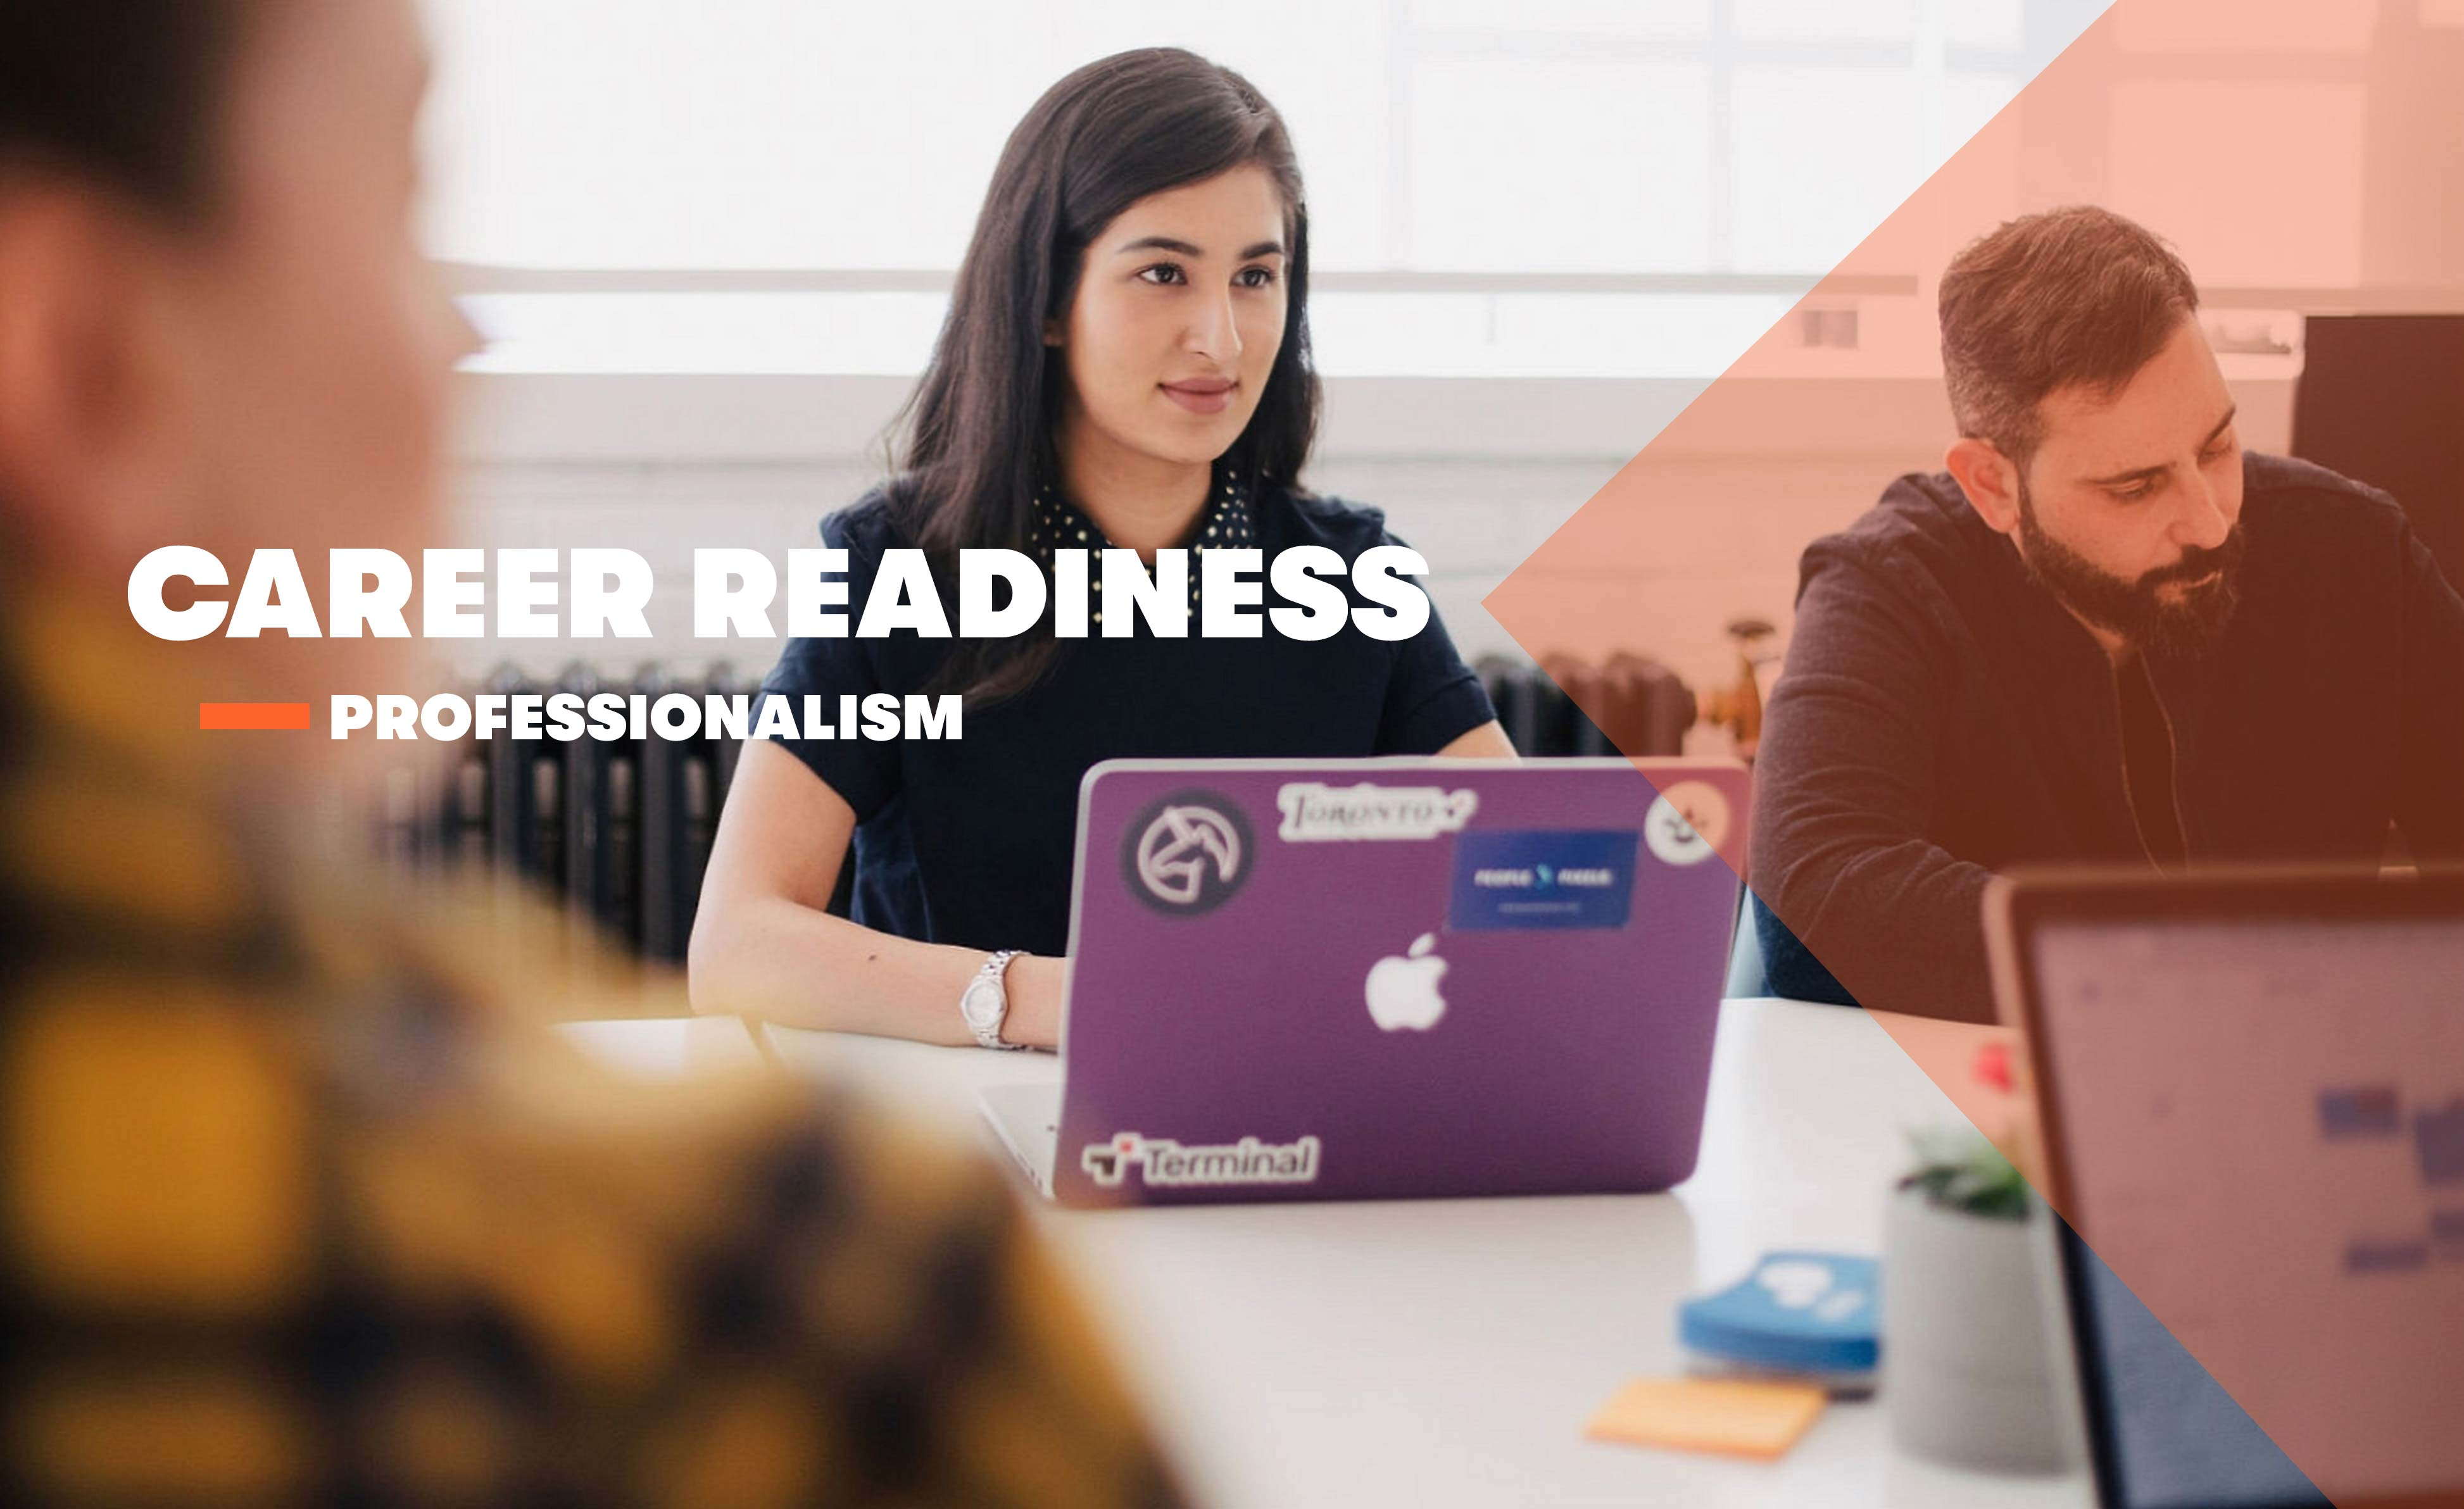 career readiness prof hero image